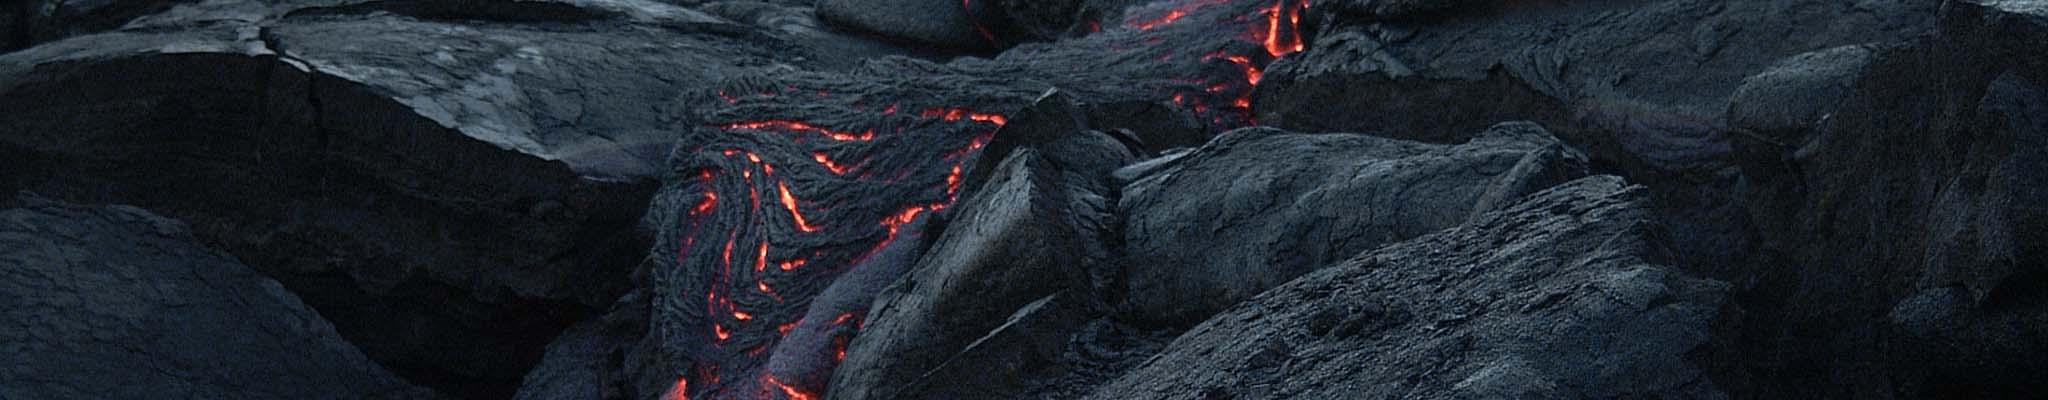 Volcano Ash